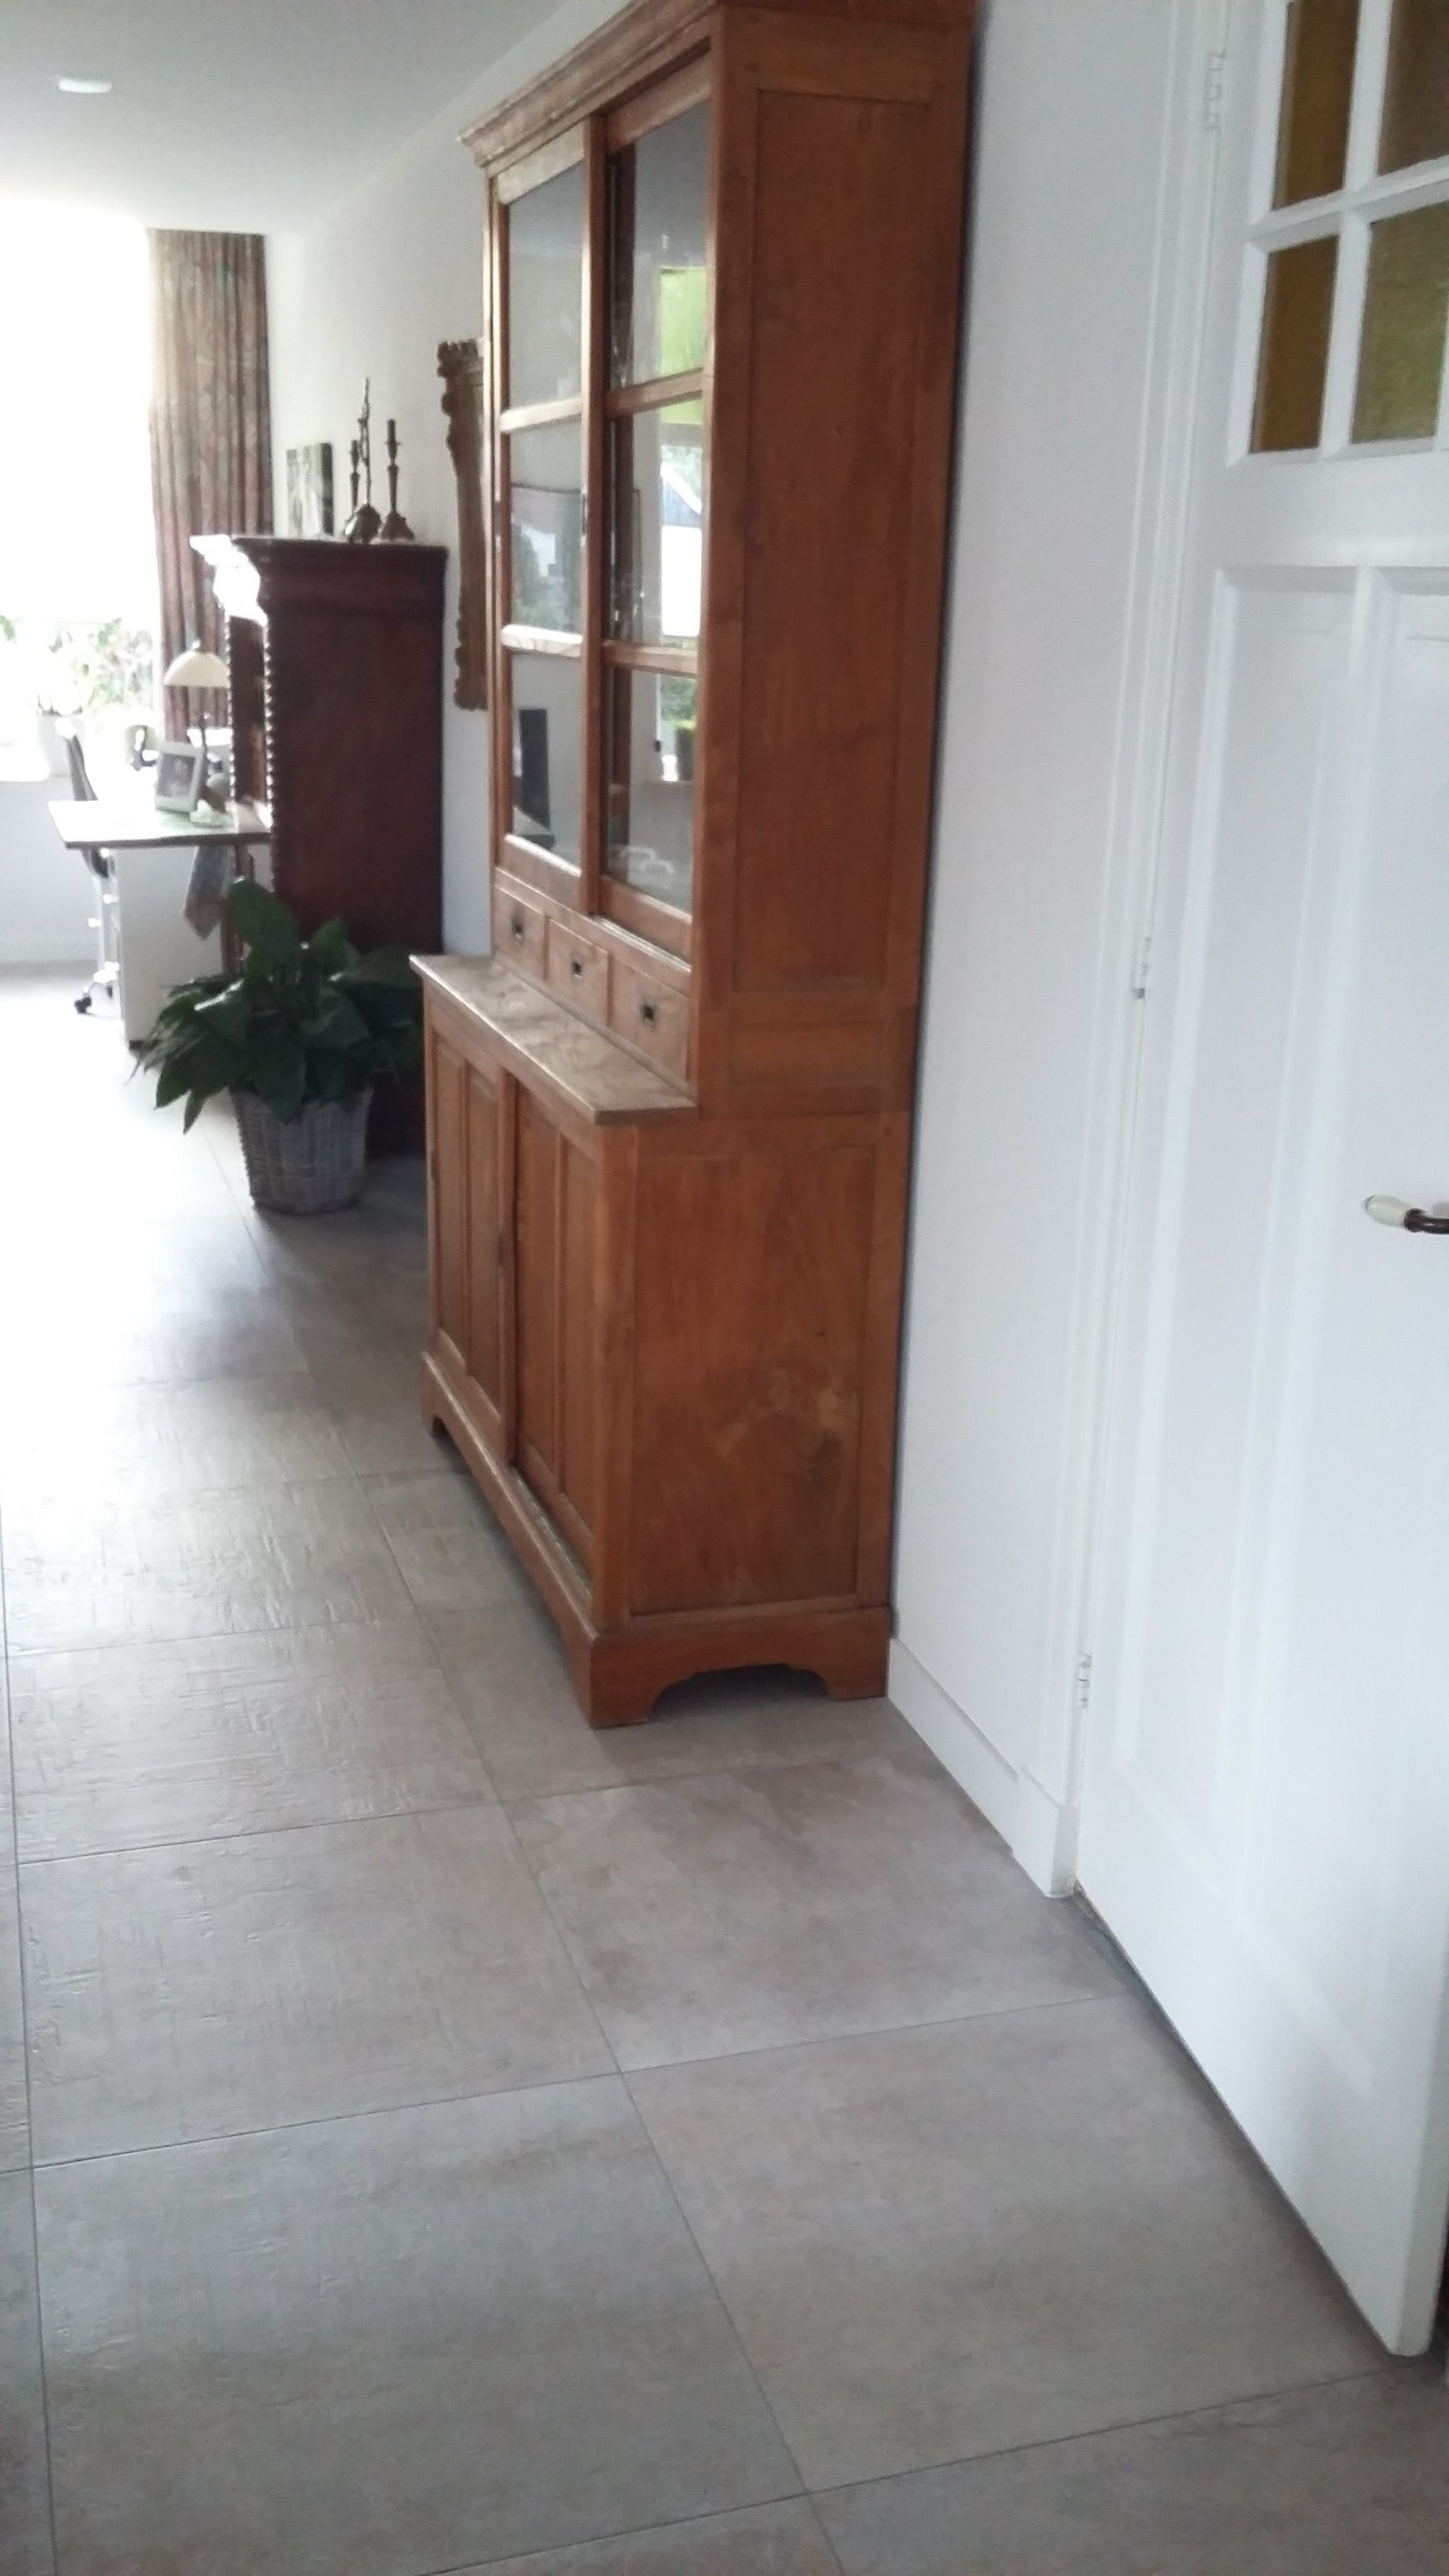 venis newport gray 60x60 cm betonlook tegels pinterest newport